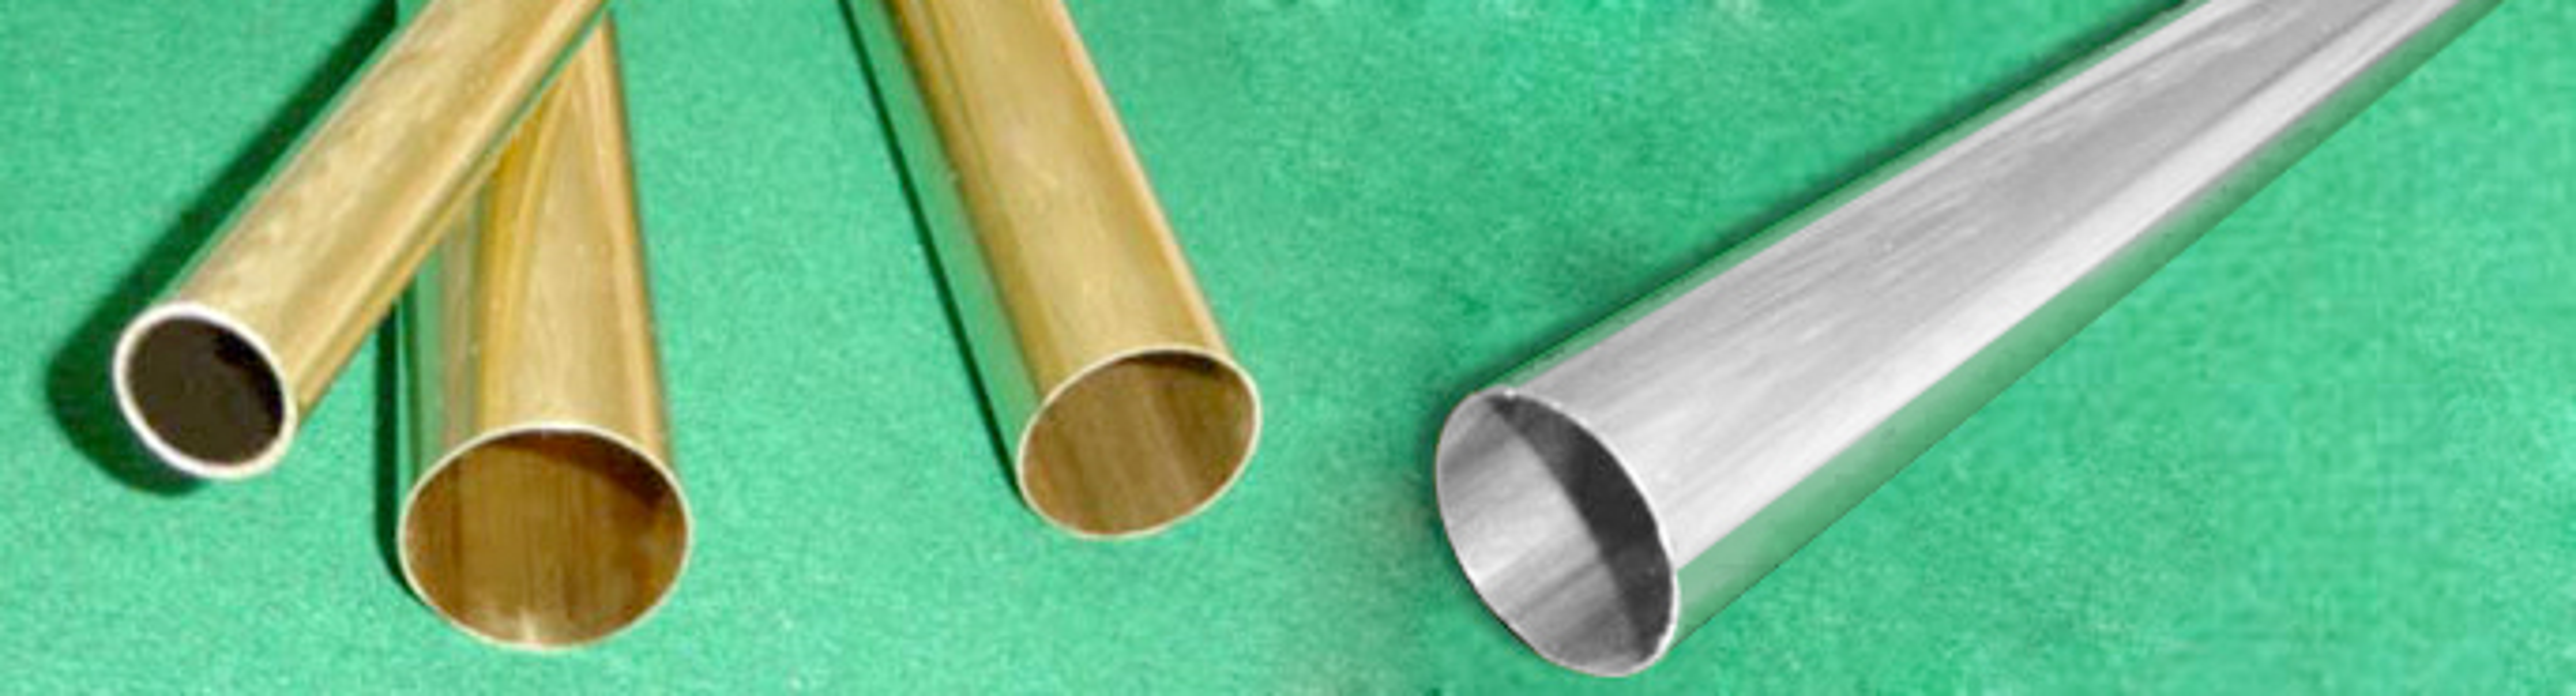 Brass & Stainless Steel Tubing for Handrails   BuyRailings